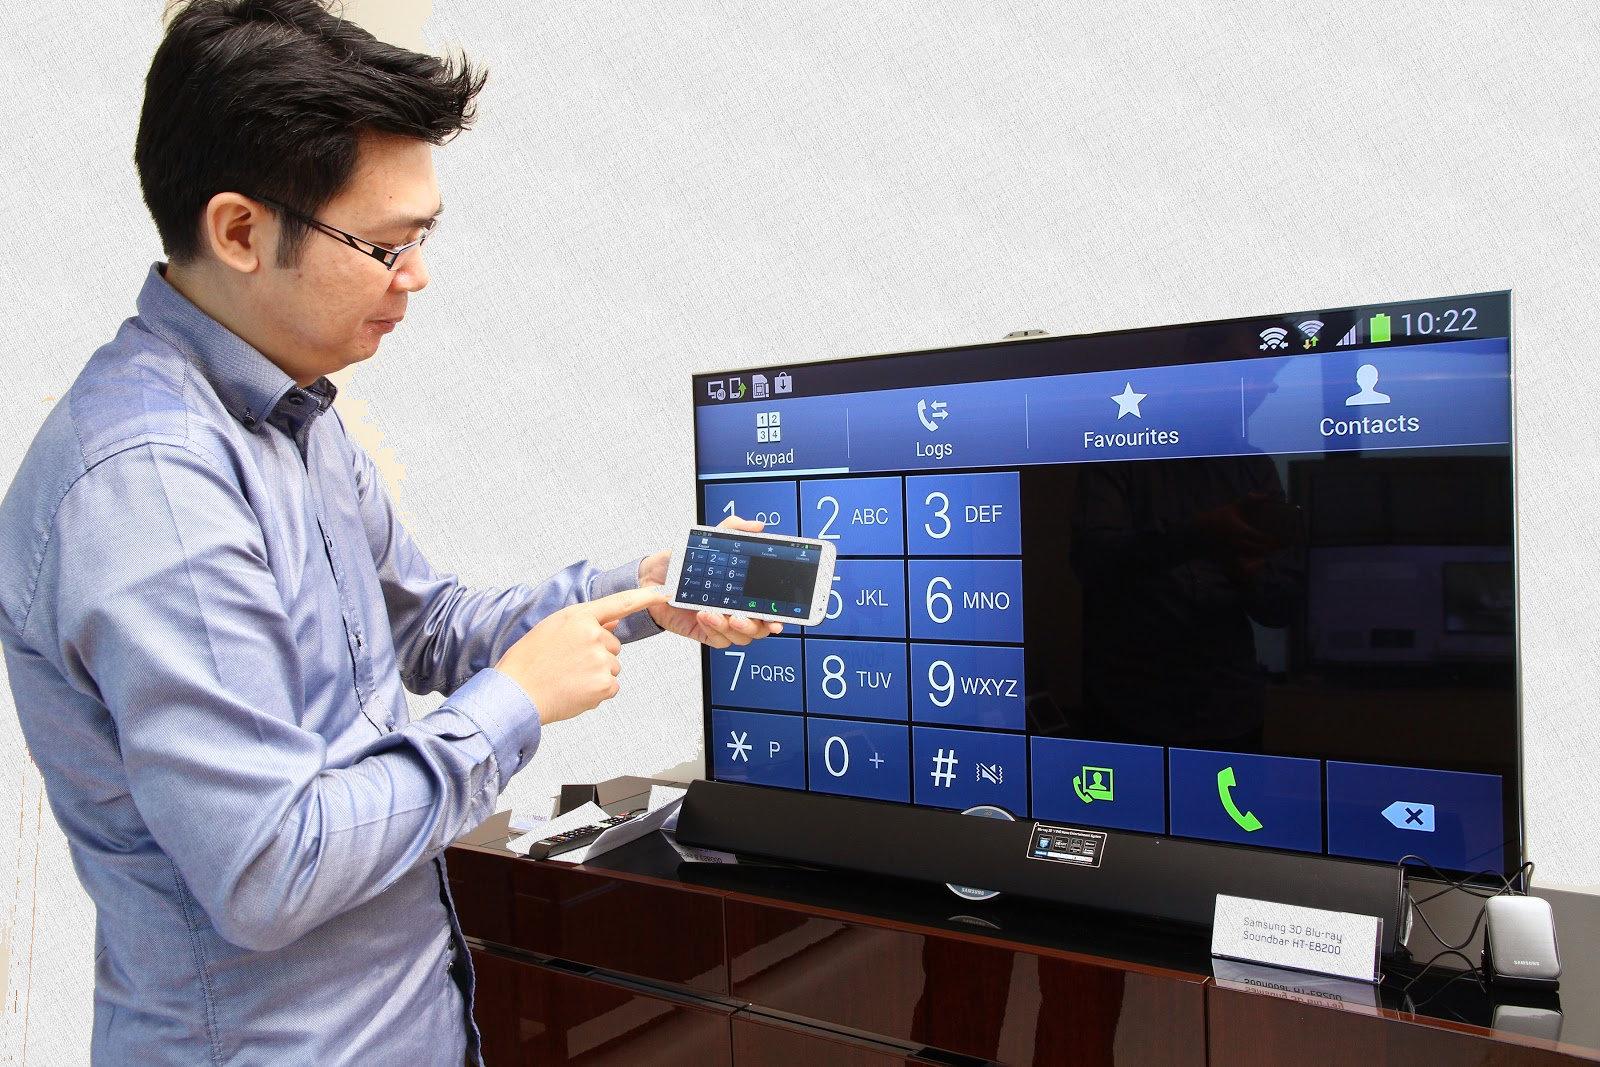 подключение смартфона к телевизору через вай-фай